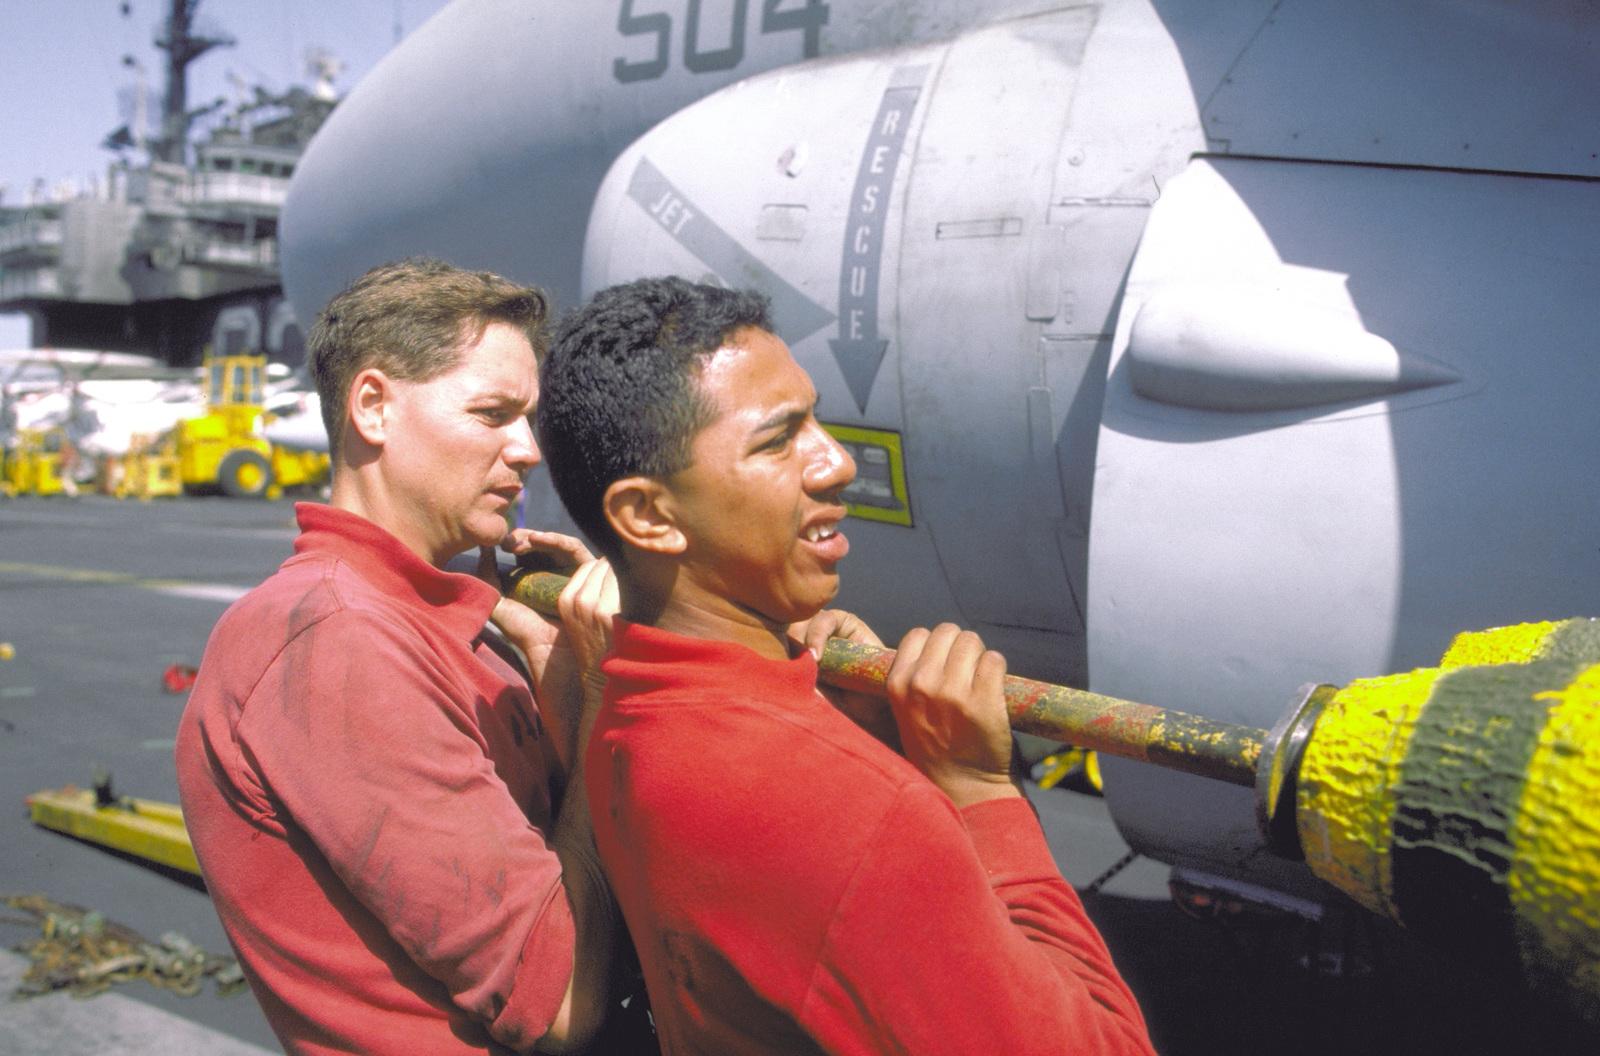 Ordnancemen of Attack Squadron 165 (VA-165) mount a Mark 82 500 pound high-drag bomb onto an A-6E Intruder aircraft aboard the aircraft carrier USS KITTY HAWK (CV-63)